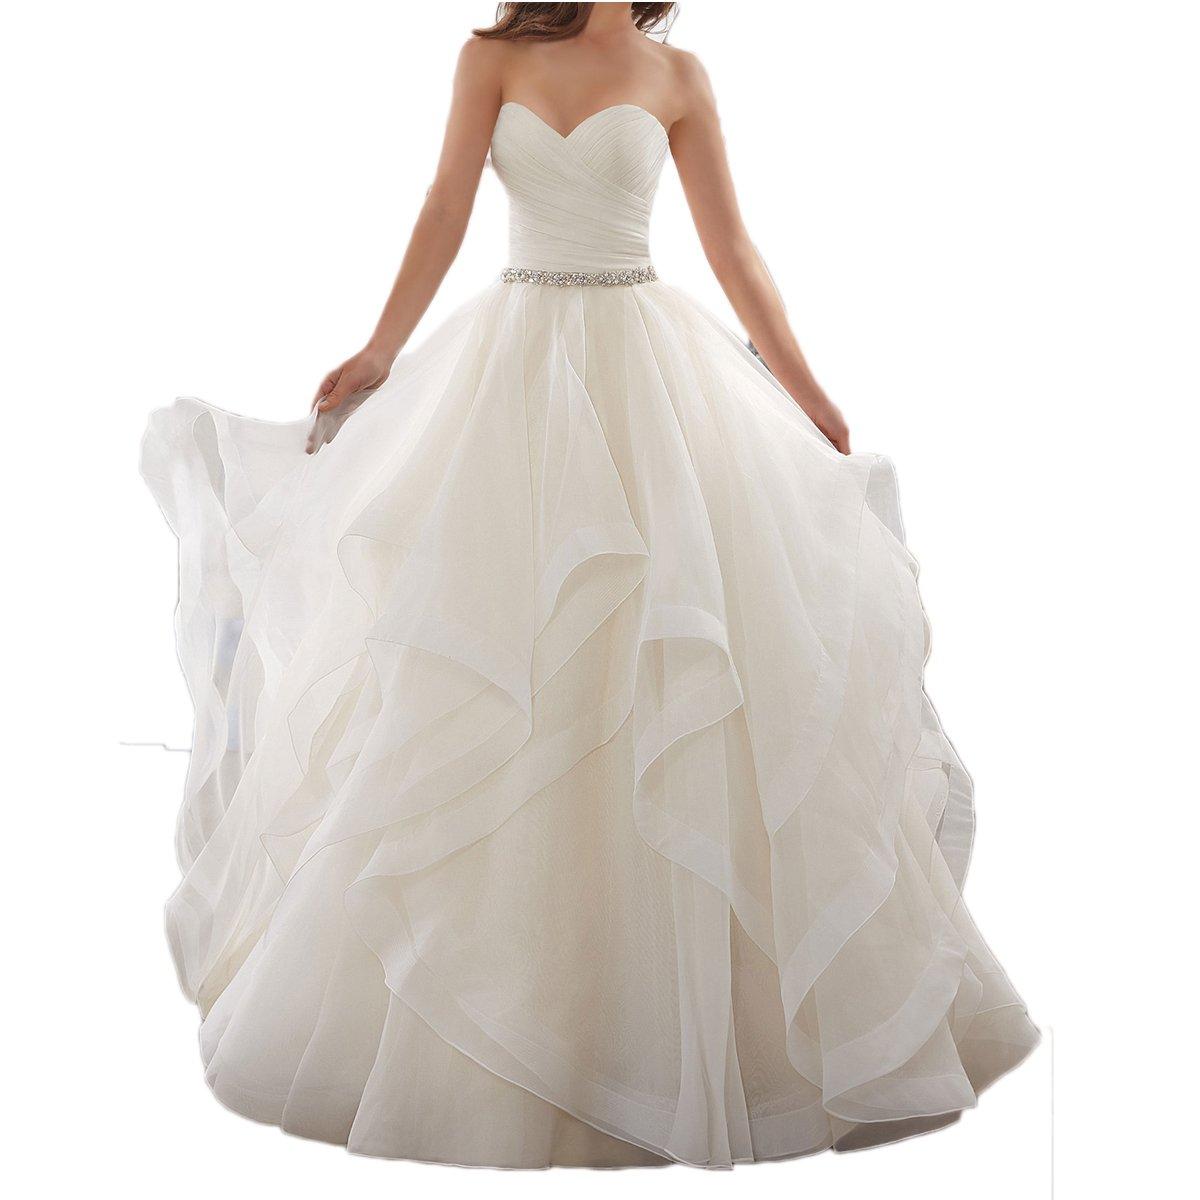 Westcorler Sweetheart Wedding Dresses Beading Sash Ruffles Tulle Ball Gown (us4, Ivory)